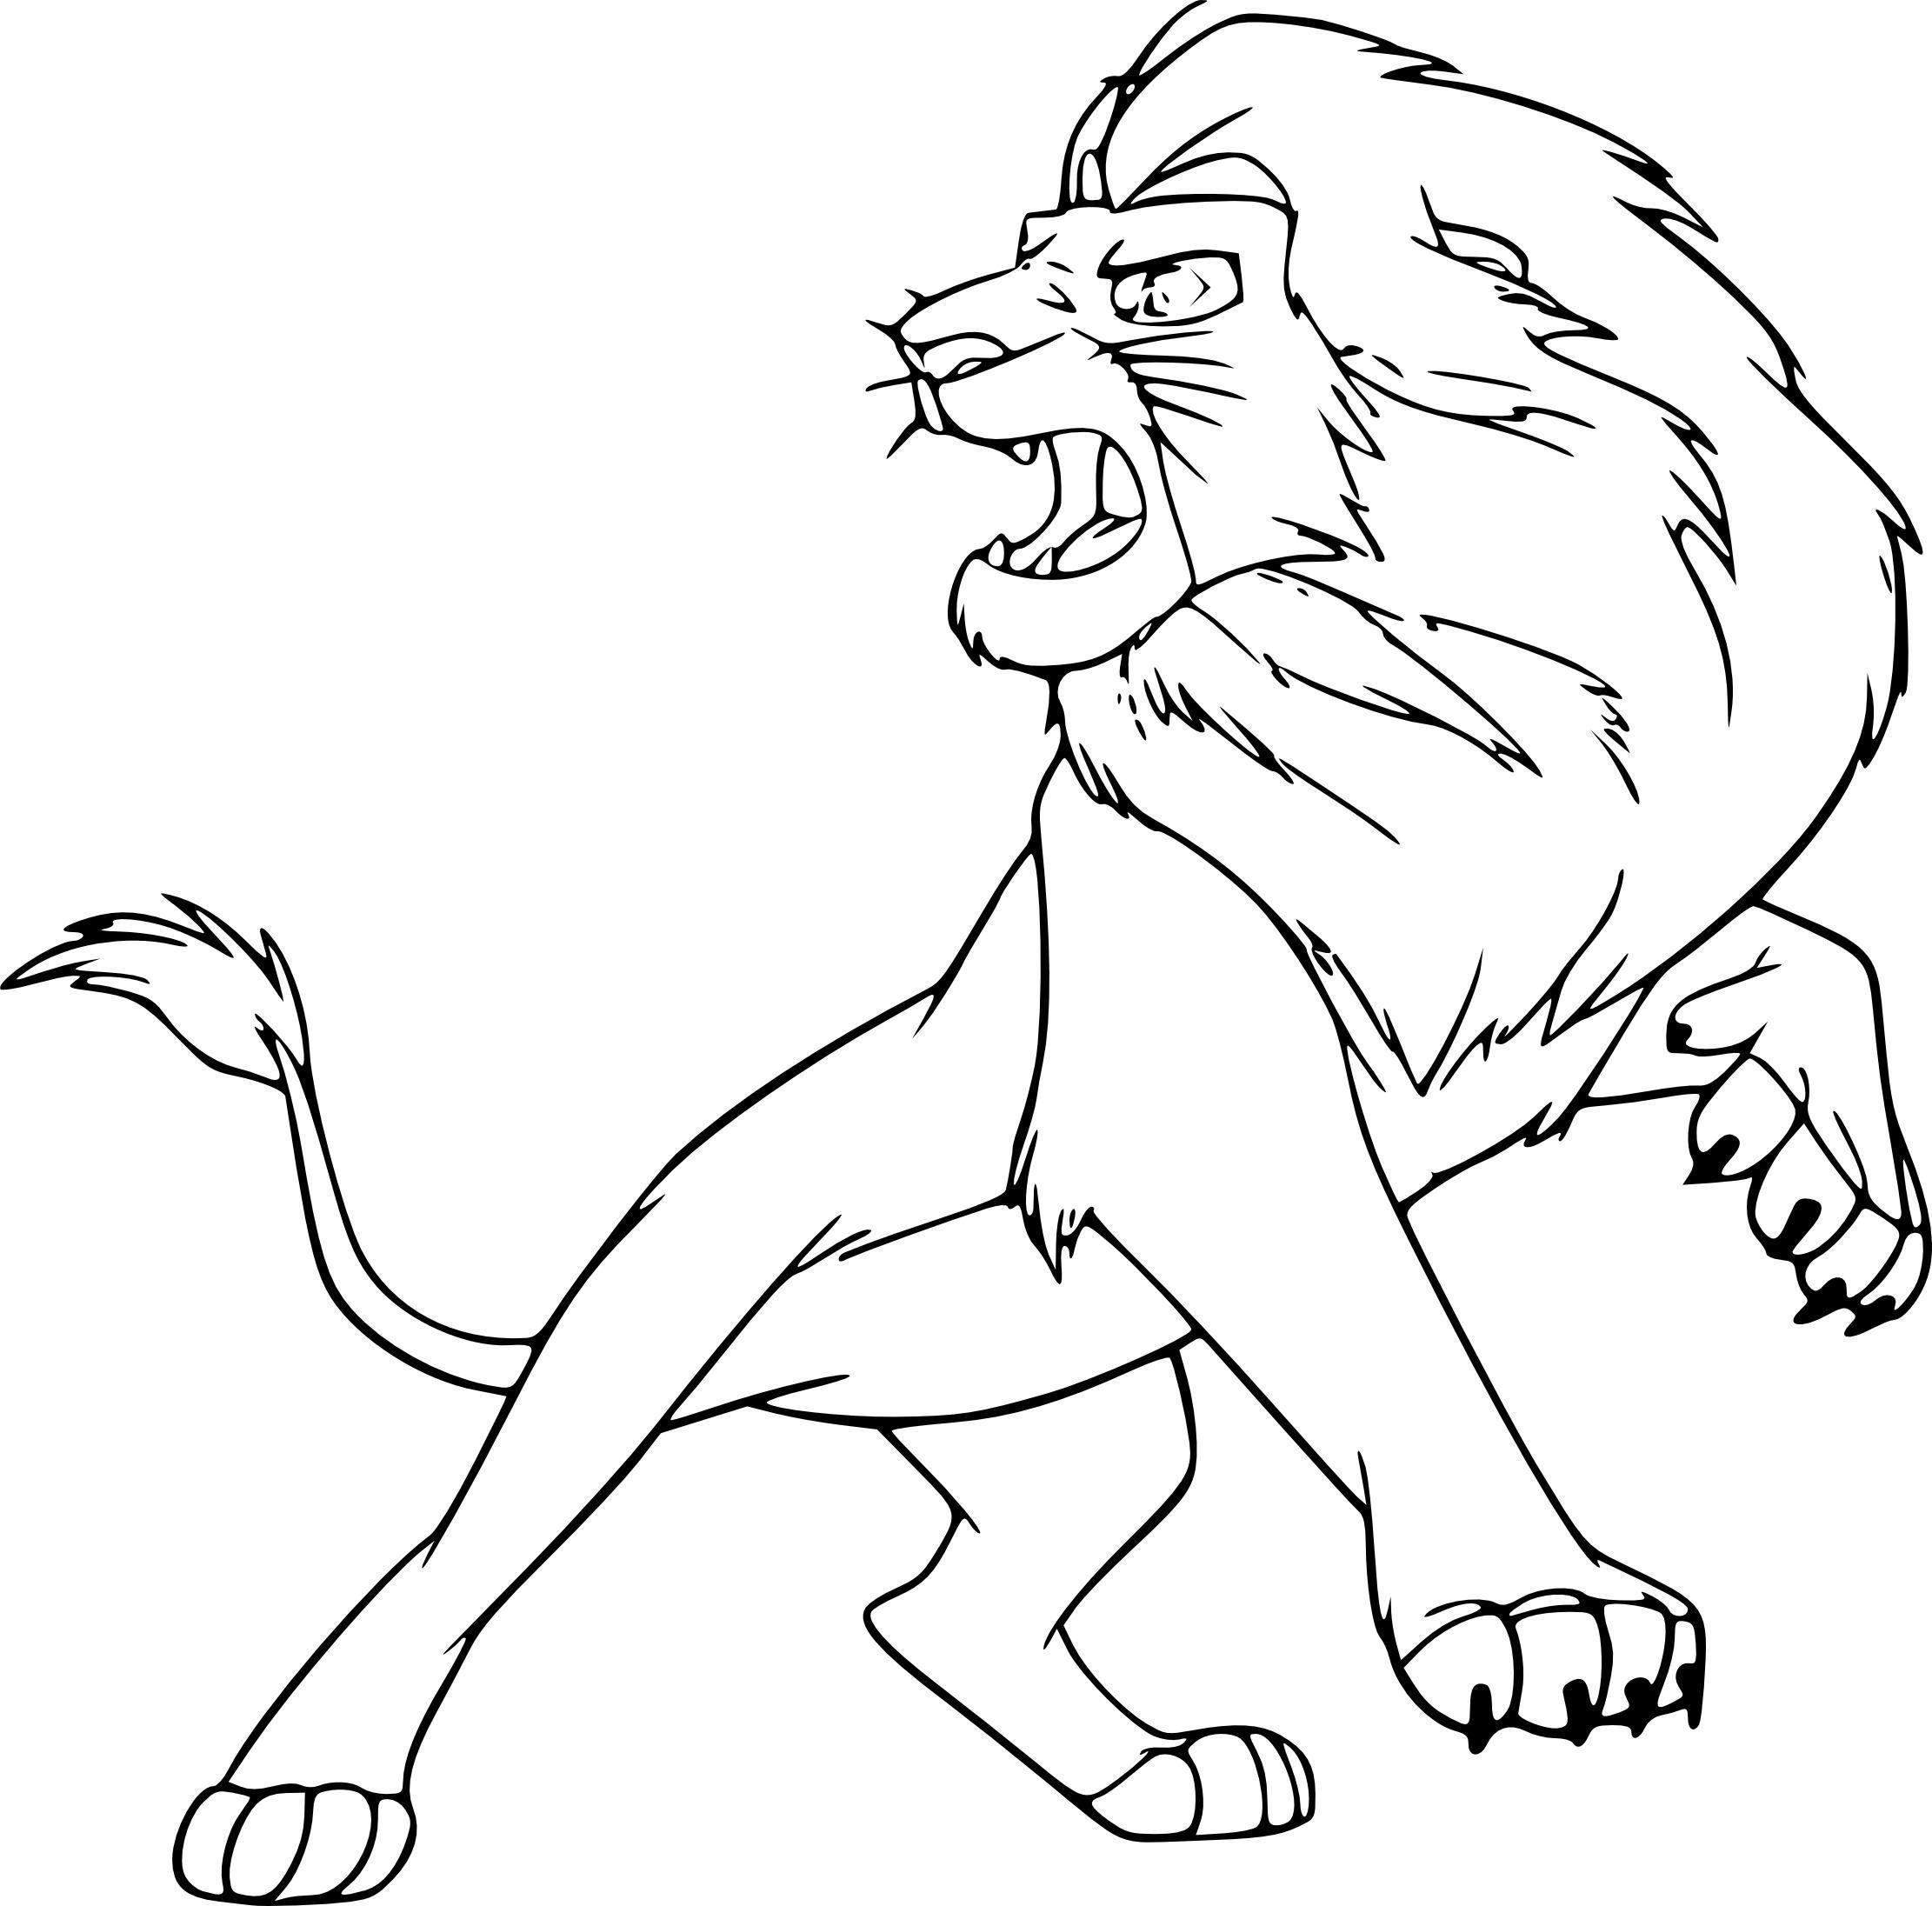 14 Coloriage à Imprimer Lion  Lion, Humanoid sketch, Design reference